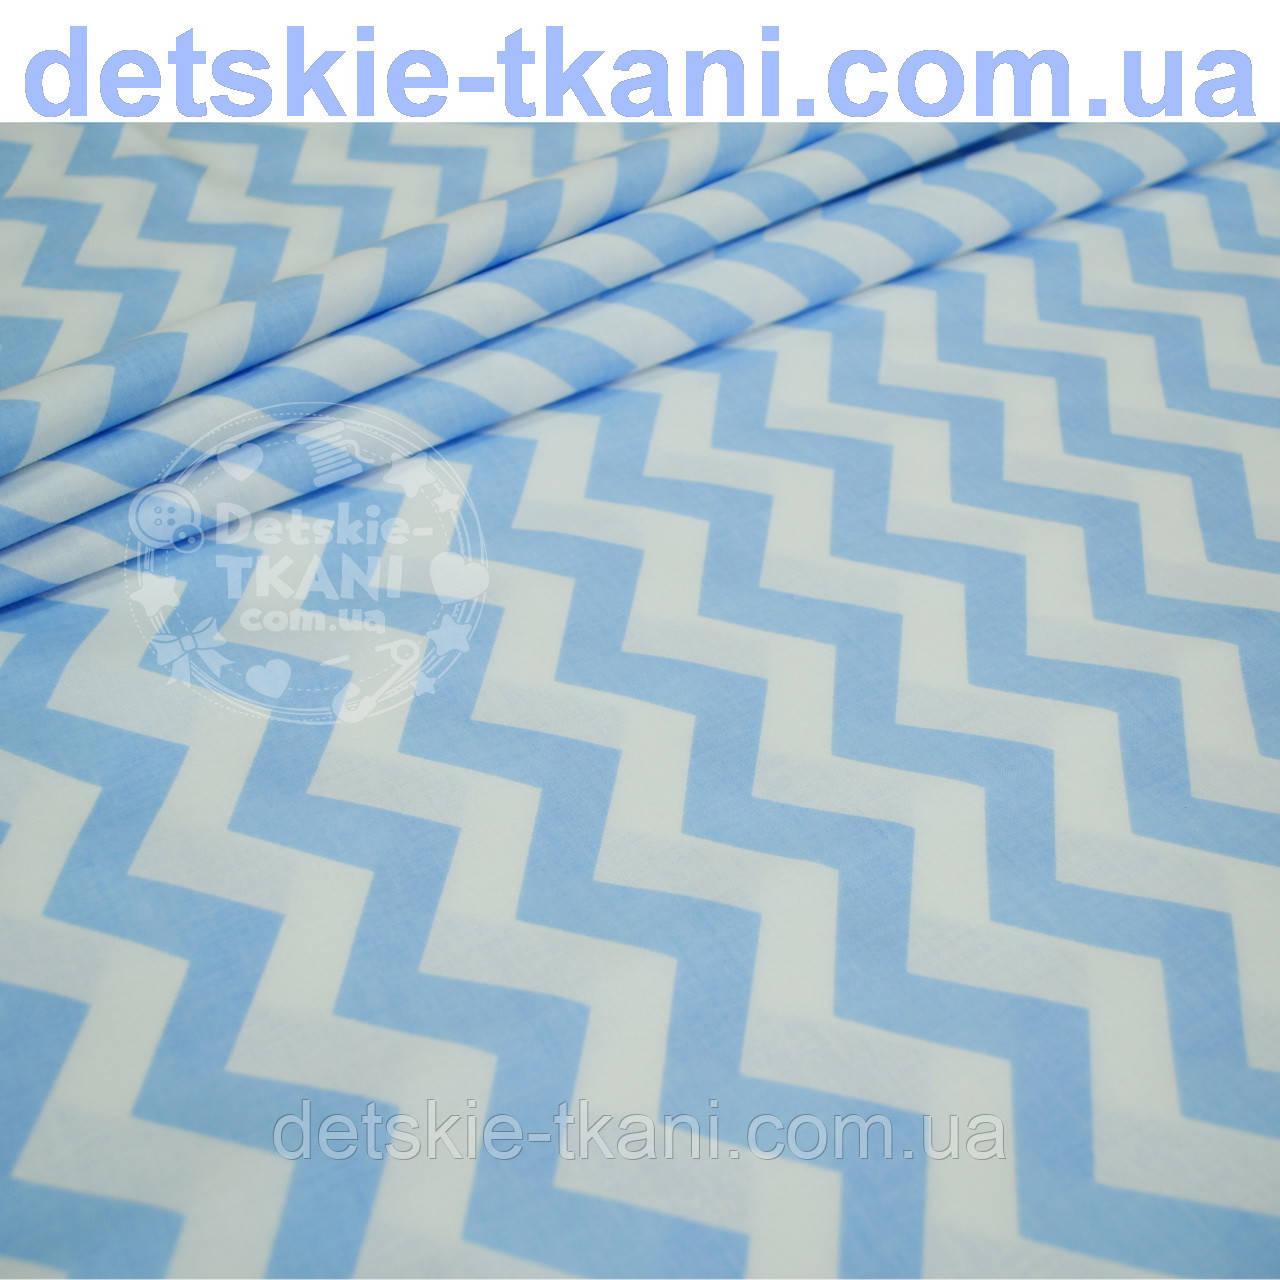 Ткань с зигзагом светло-голубого цвета, плотность 125 г/м2 (№ 734а)